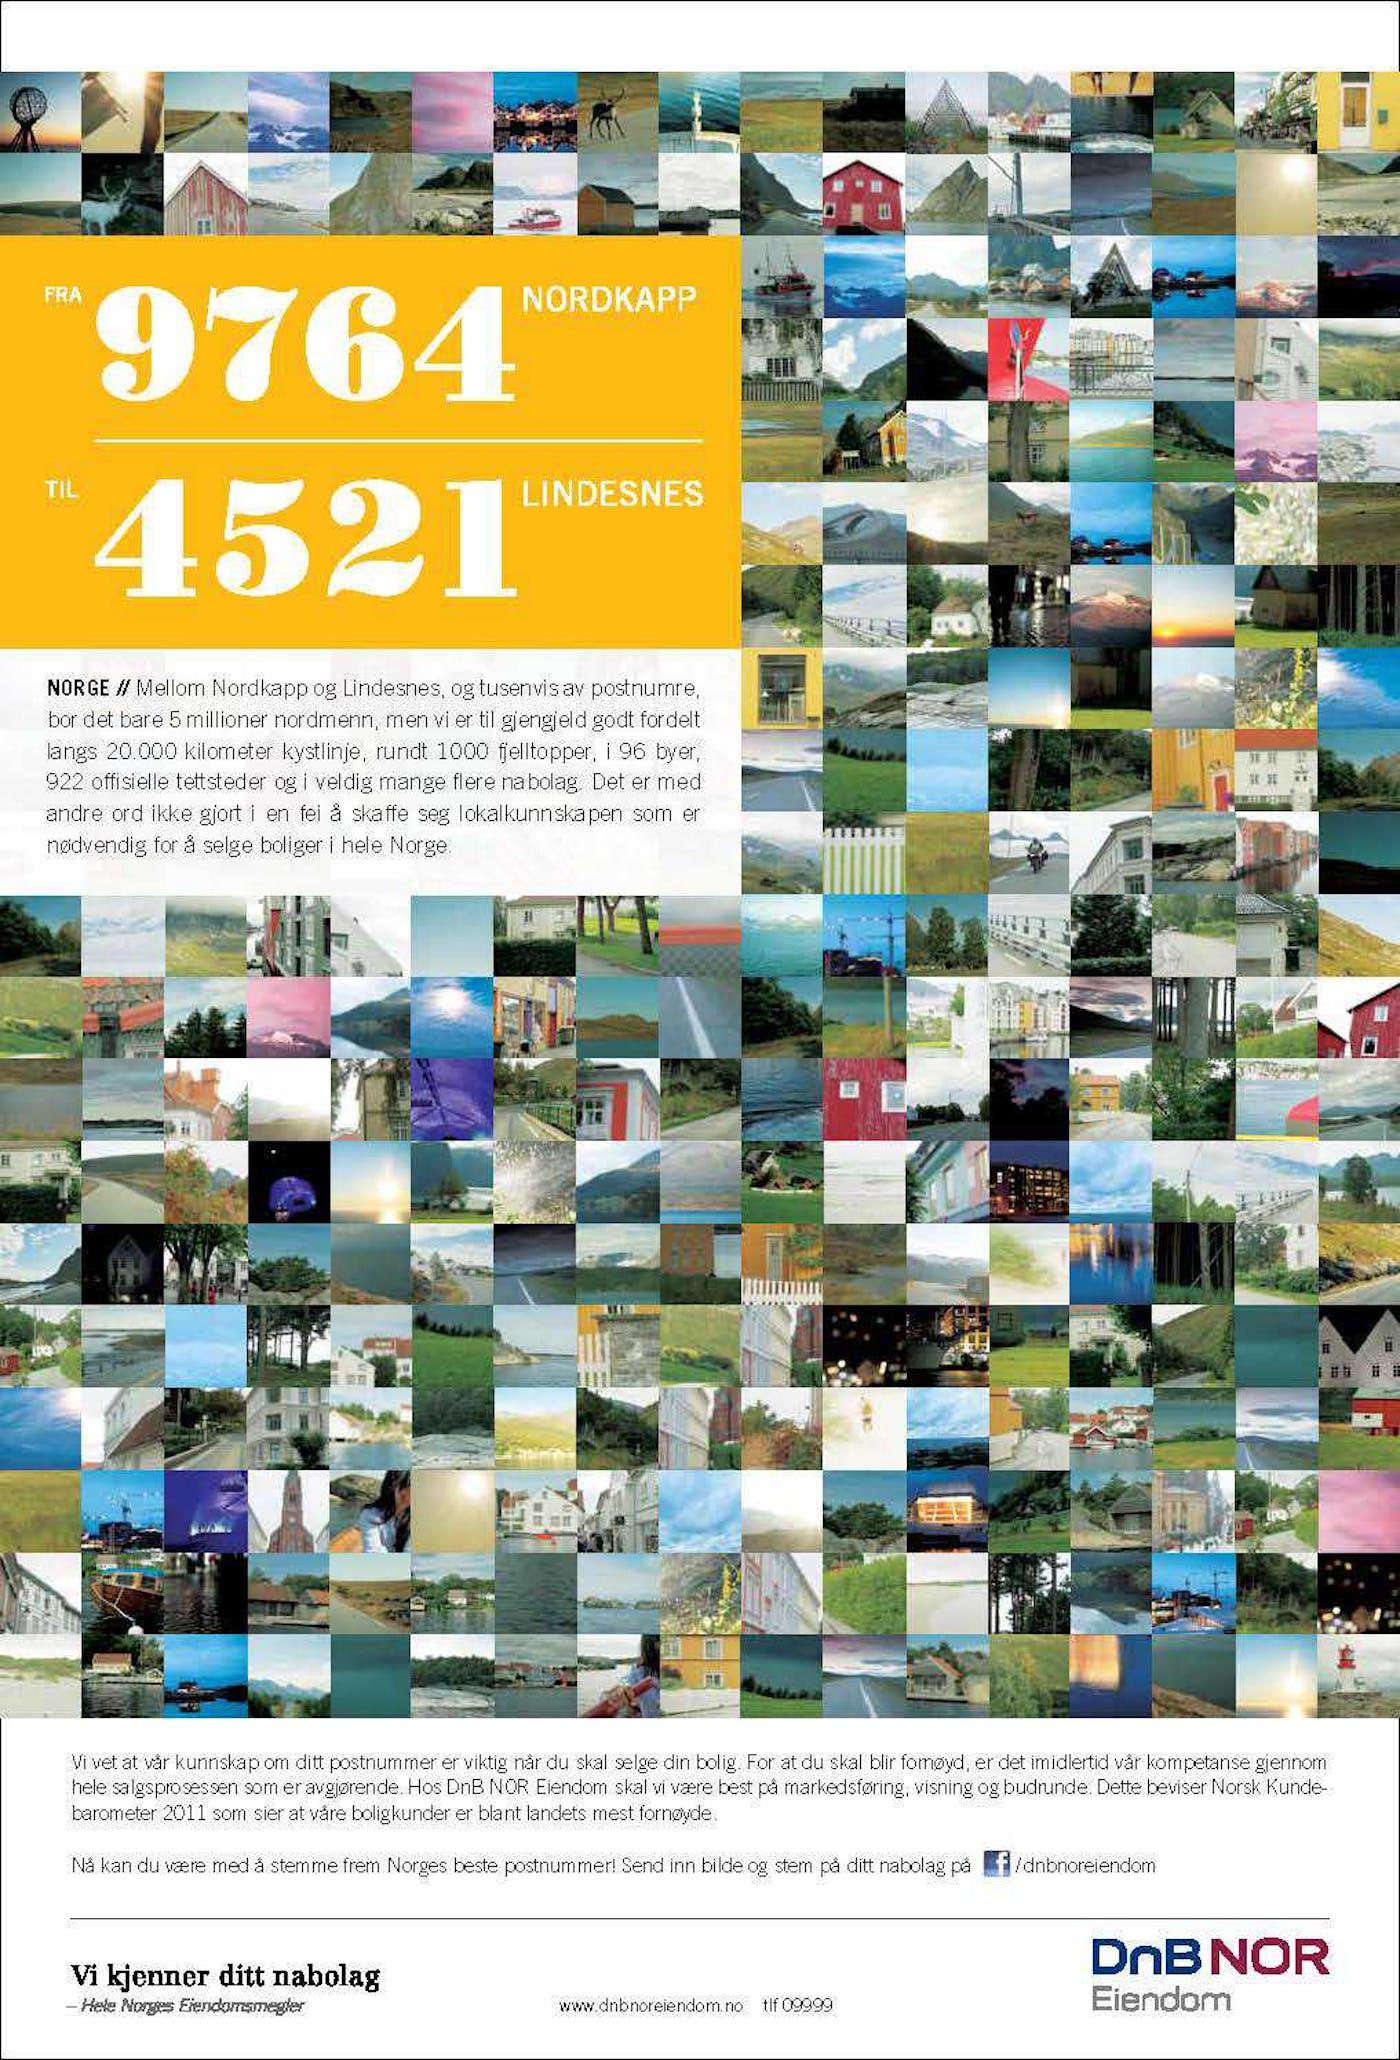 16866 65bdb original